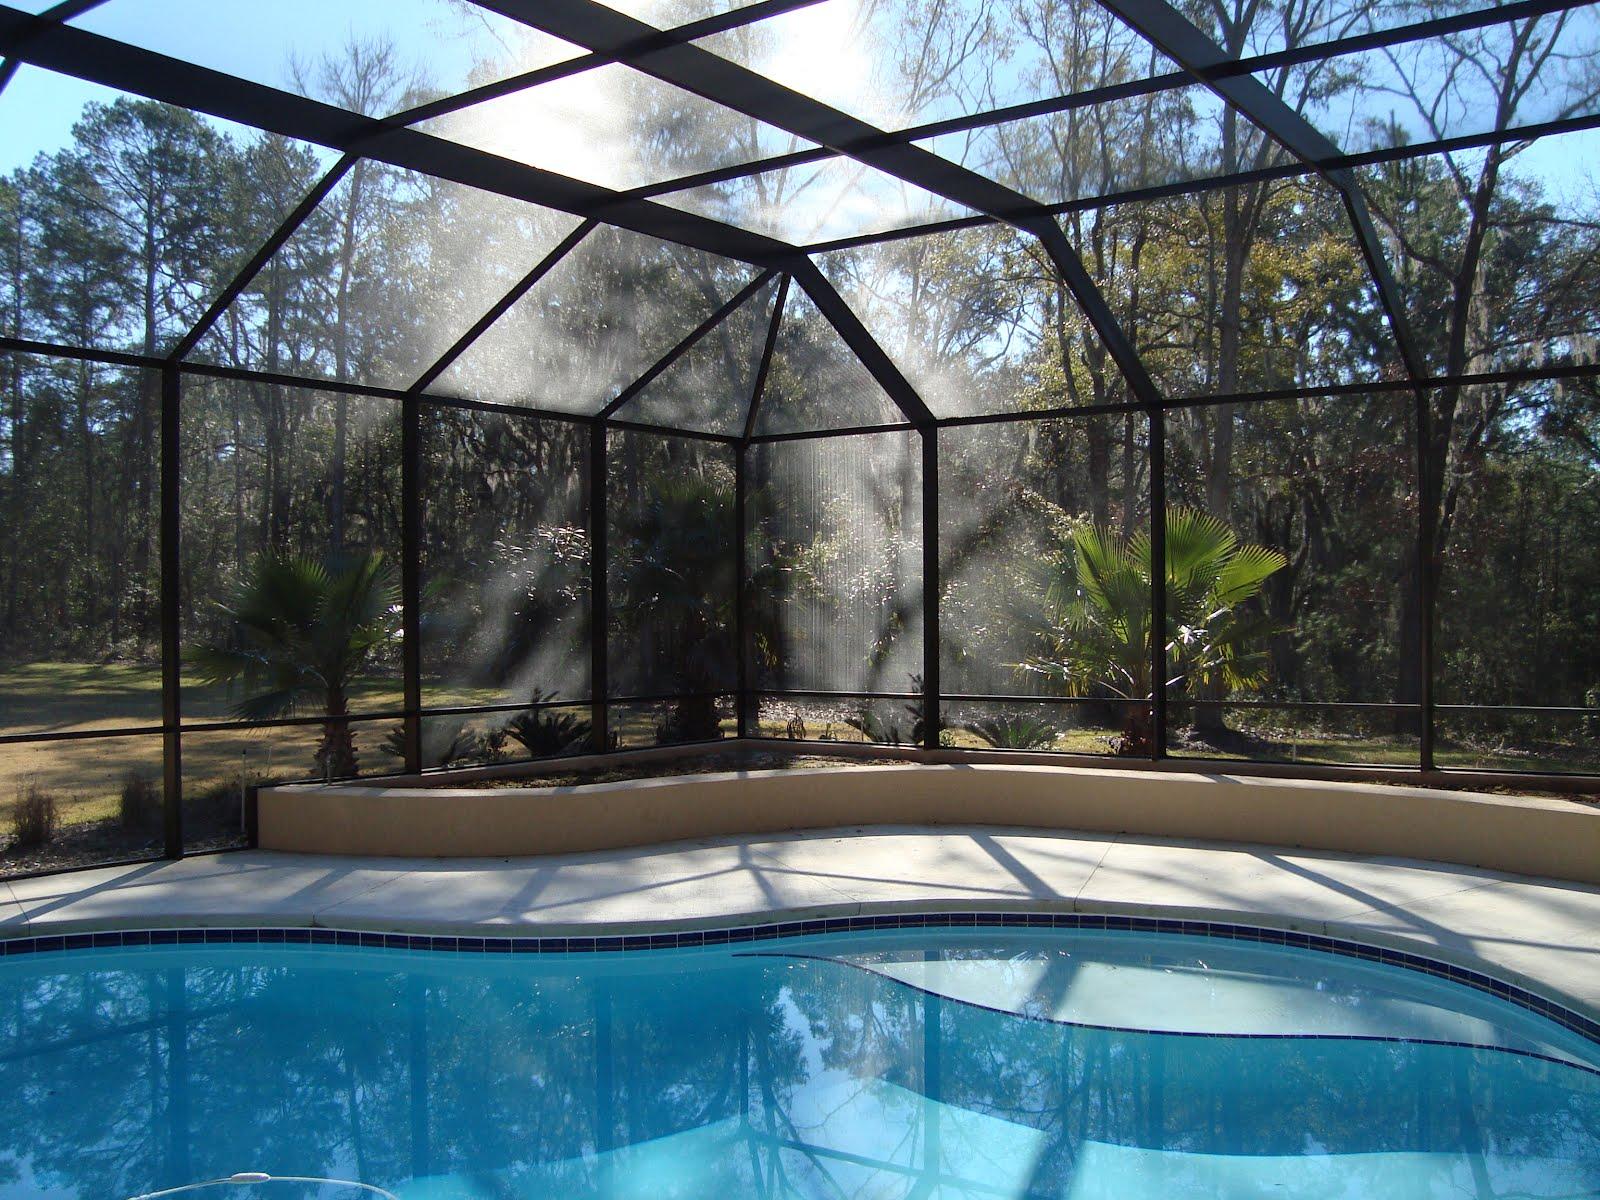 Pool enclosures usa thomasville georgia pool enclosures for Pool enclosures prices